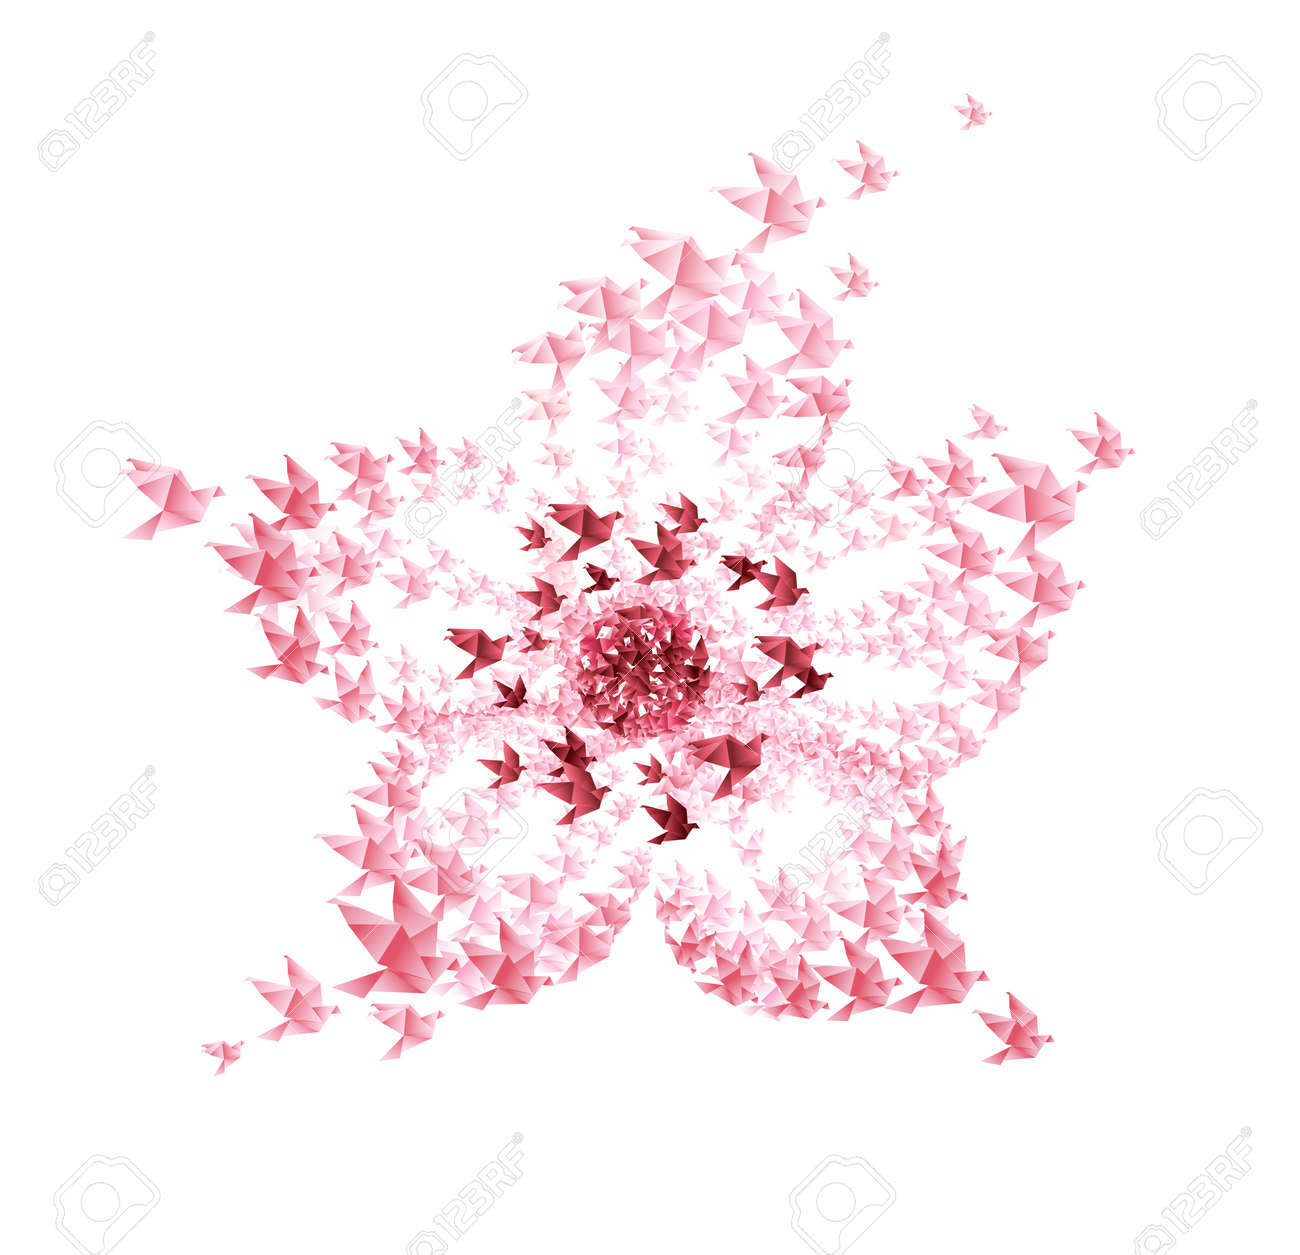 Origami Cherry Blossom   Origami blume, Kreativ, Bastelideen   1255x1300